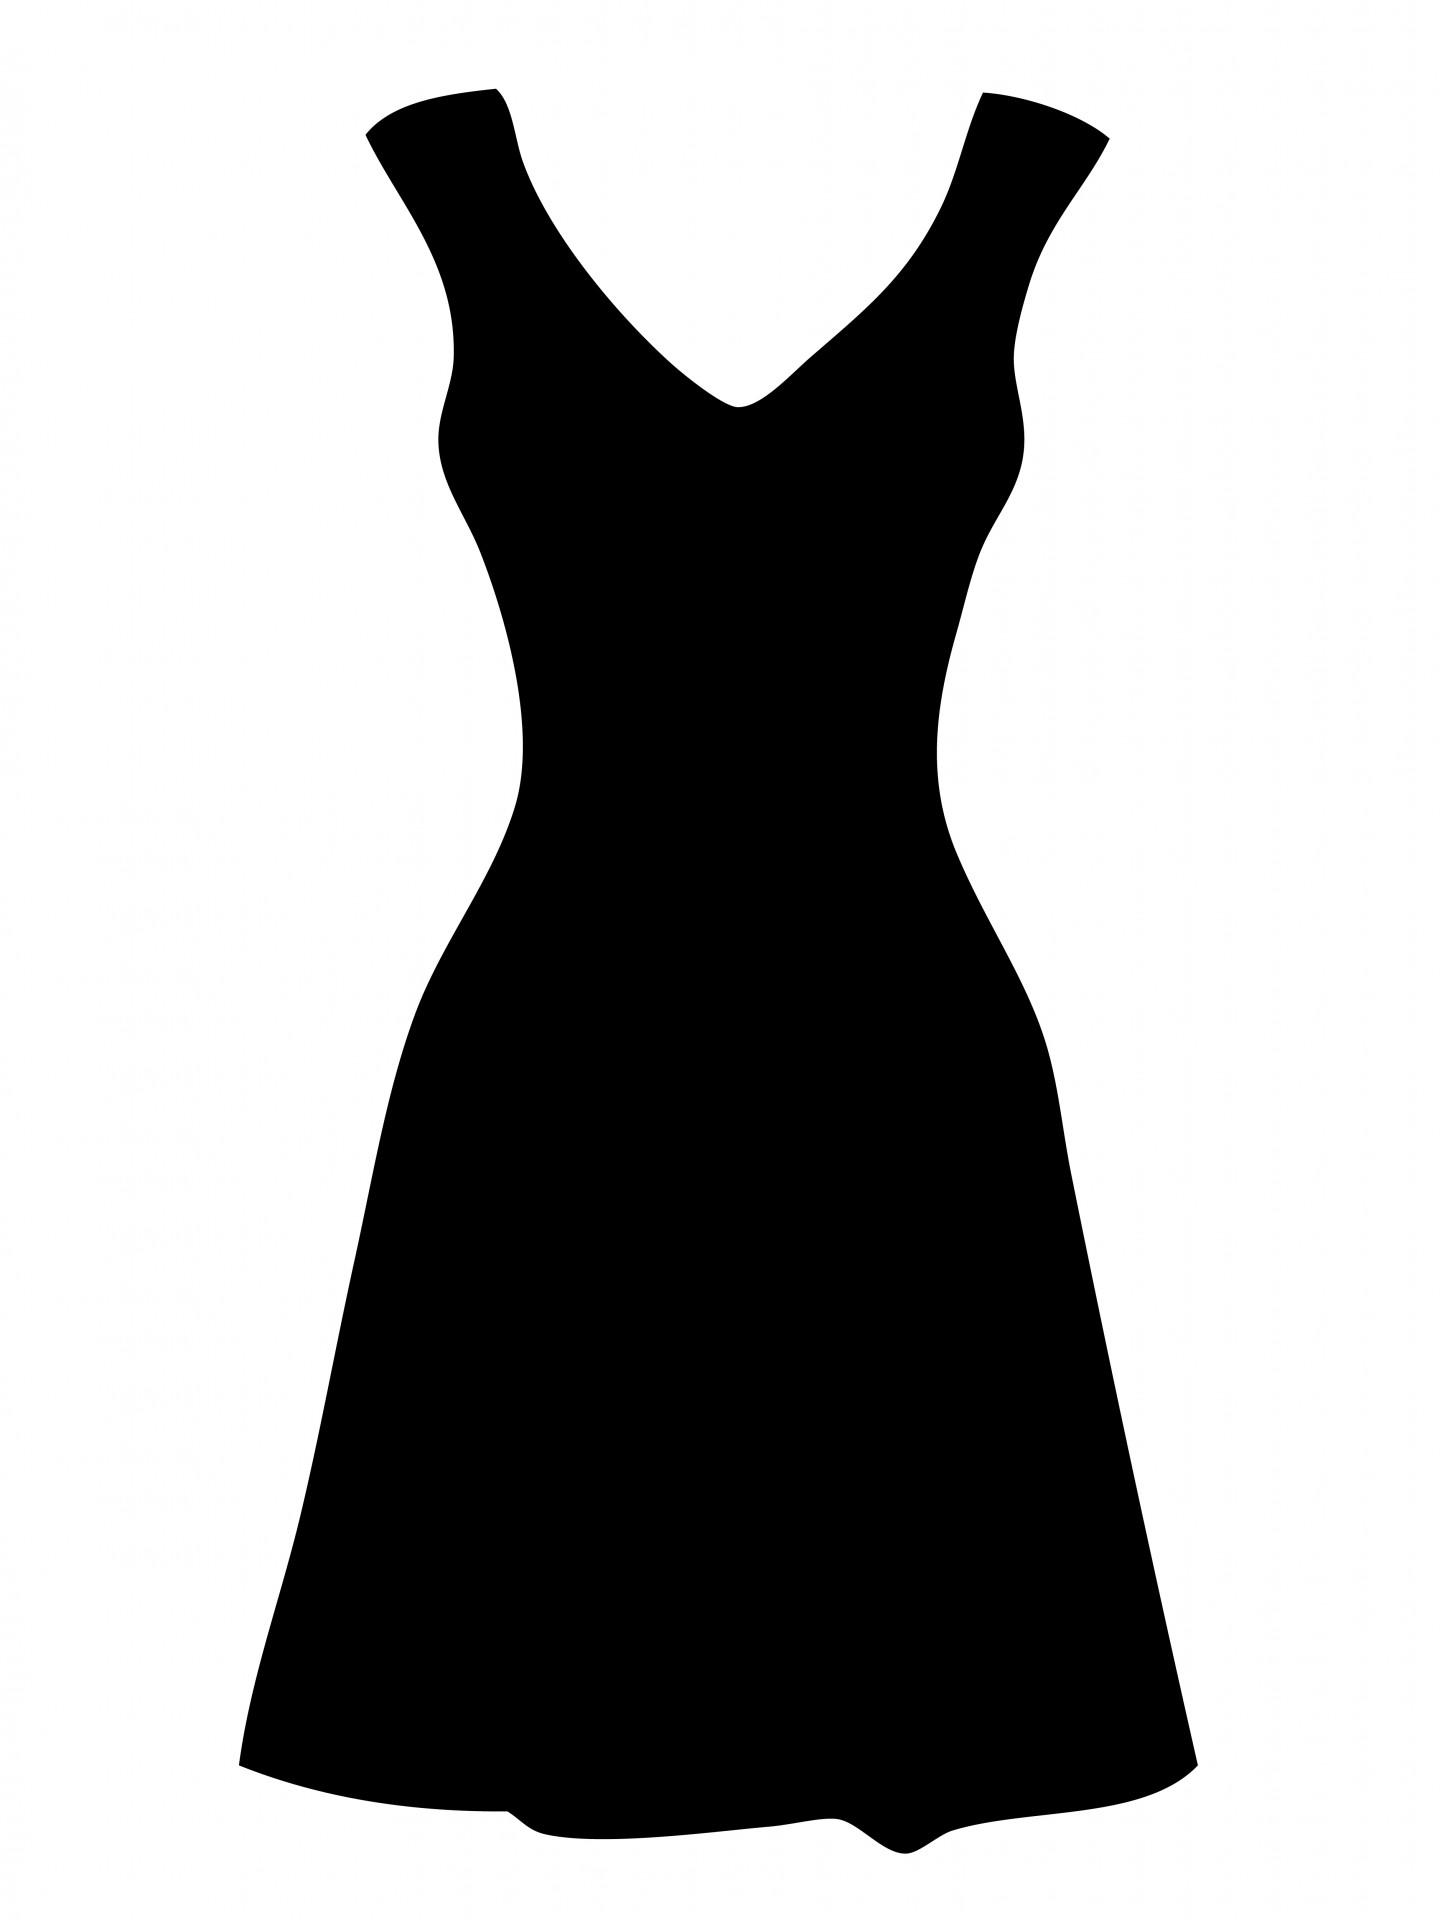 1440x1920 Dress Clip Art